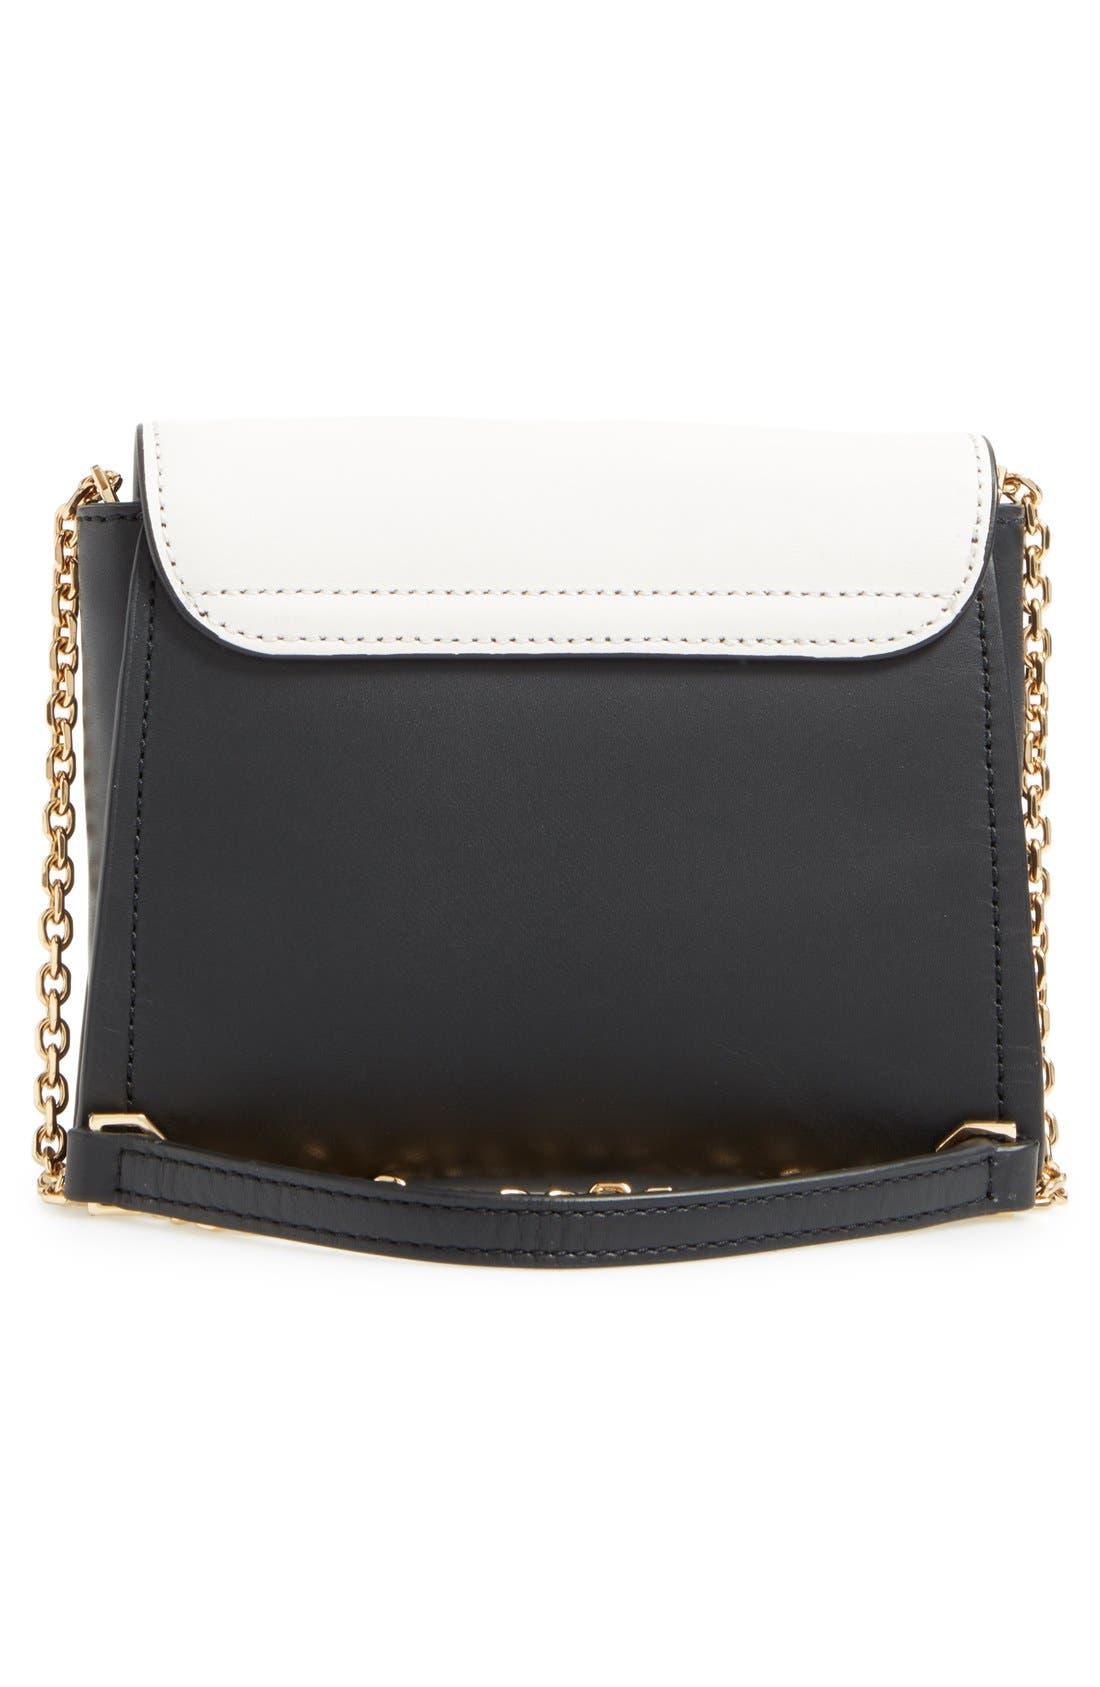 LOUISE ET CIE, 'Towa Micro' Colorblock Leather Bag, Alternate thumbnail 5, color, 100